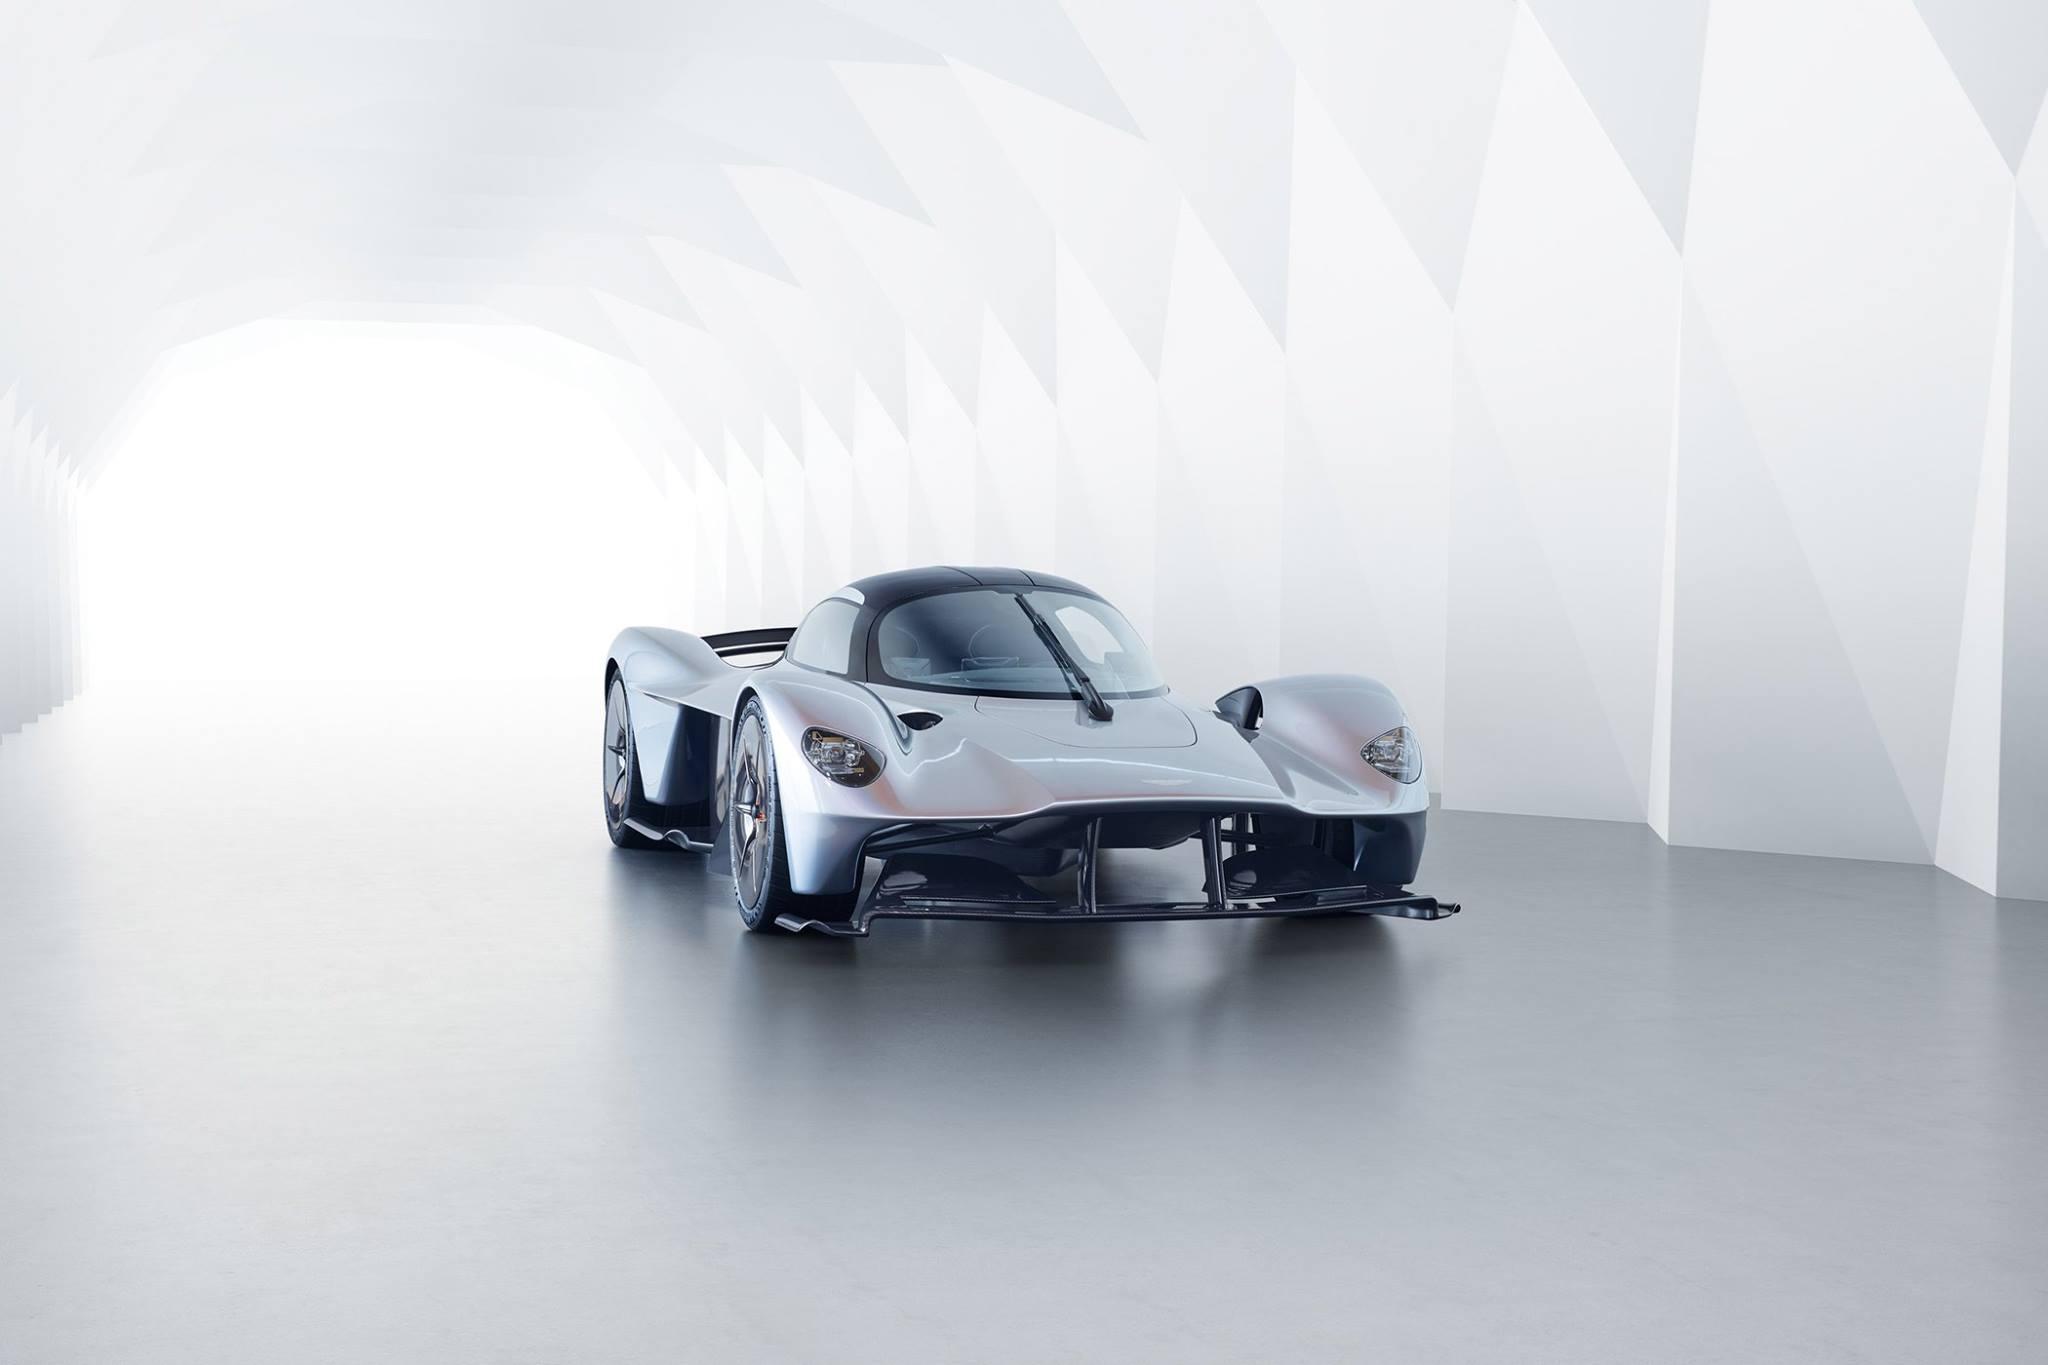 Aston-Martin-Valkyrie-Production-Version-2